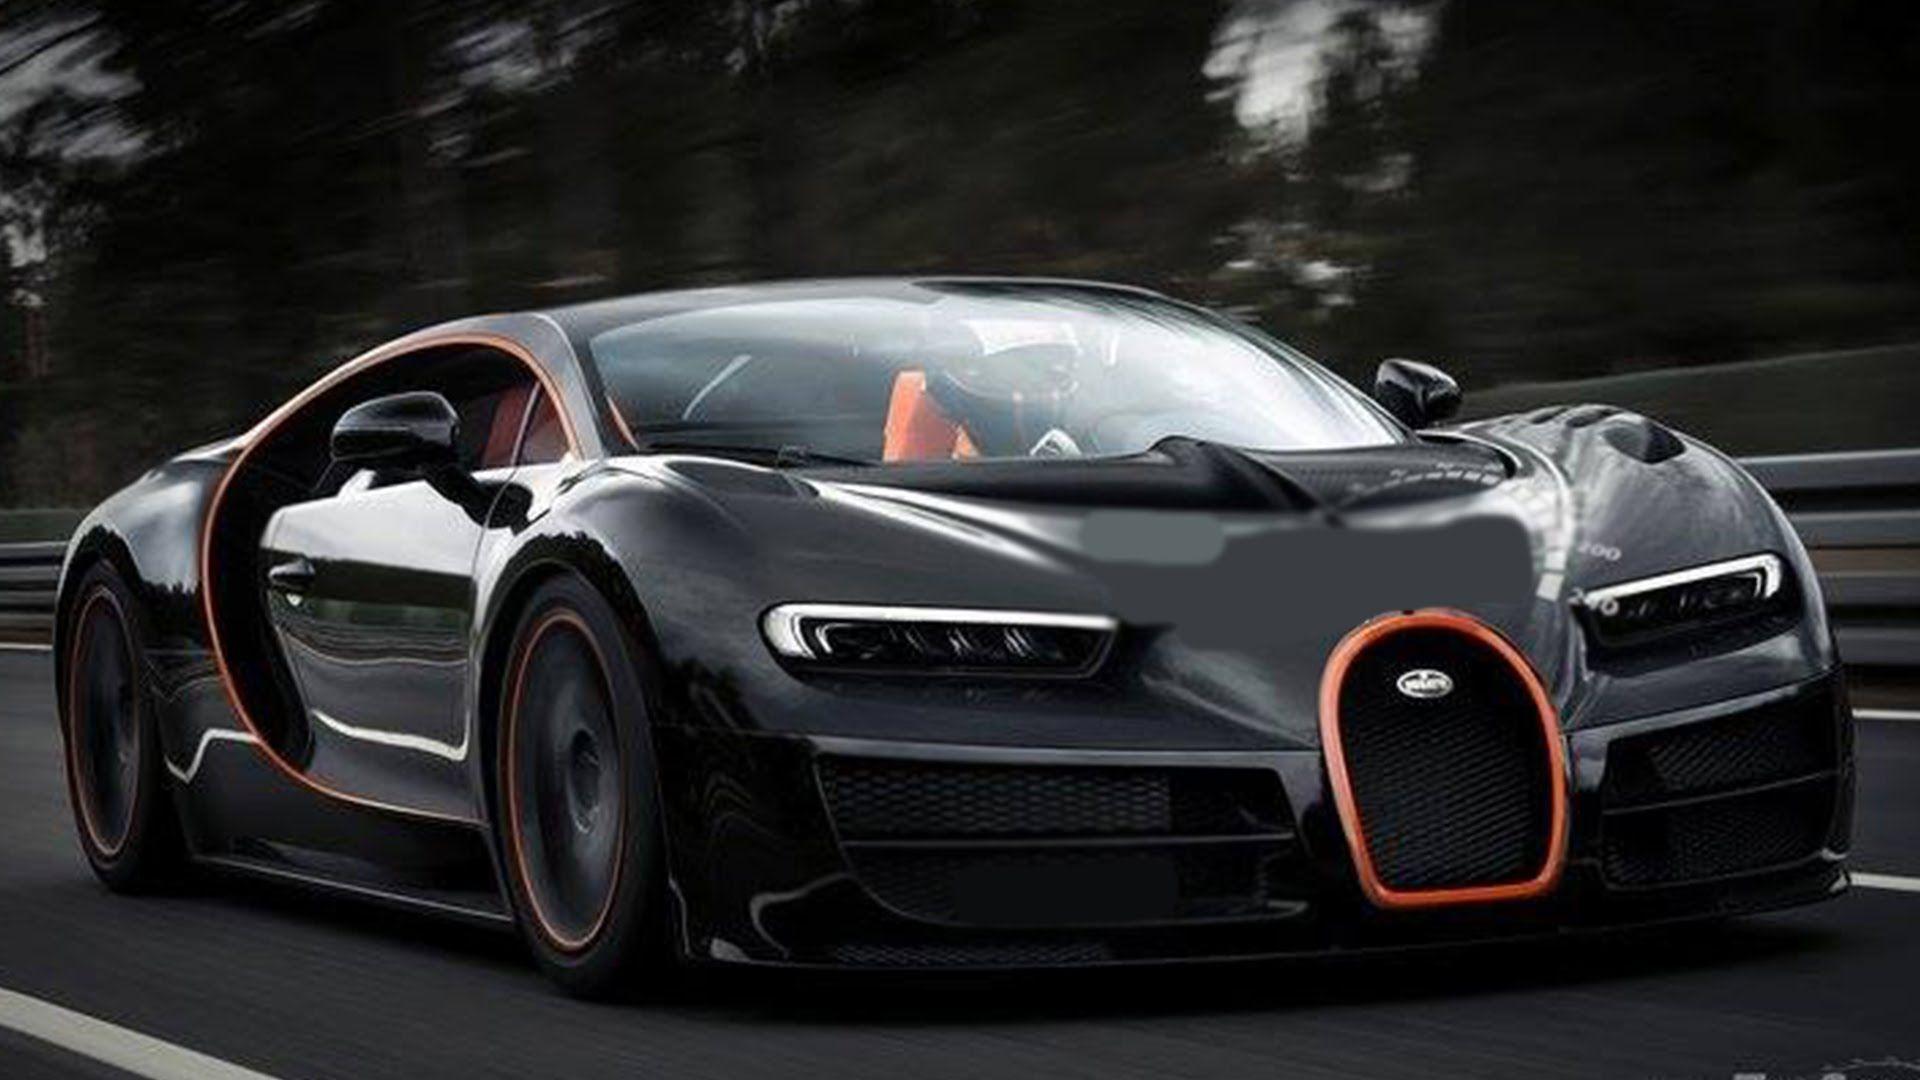 Bugatti Chiron 2018 Wallpapers - Wallpaper Cave